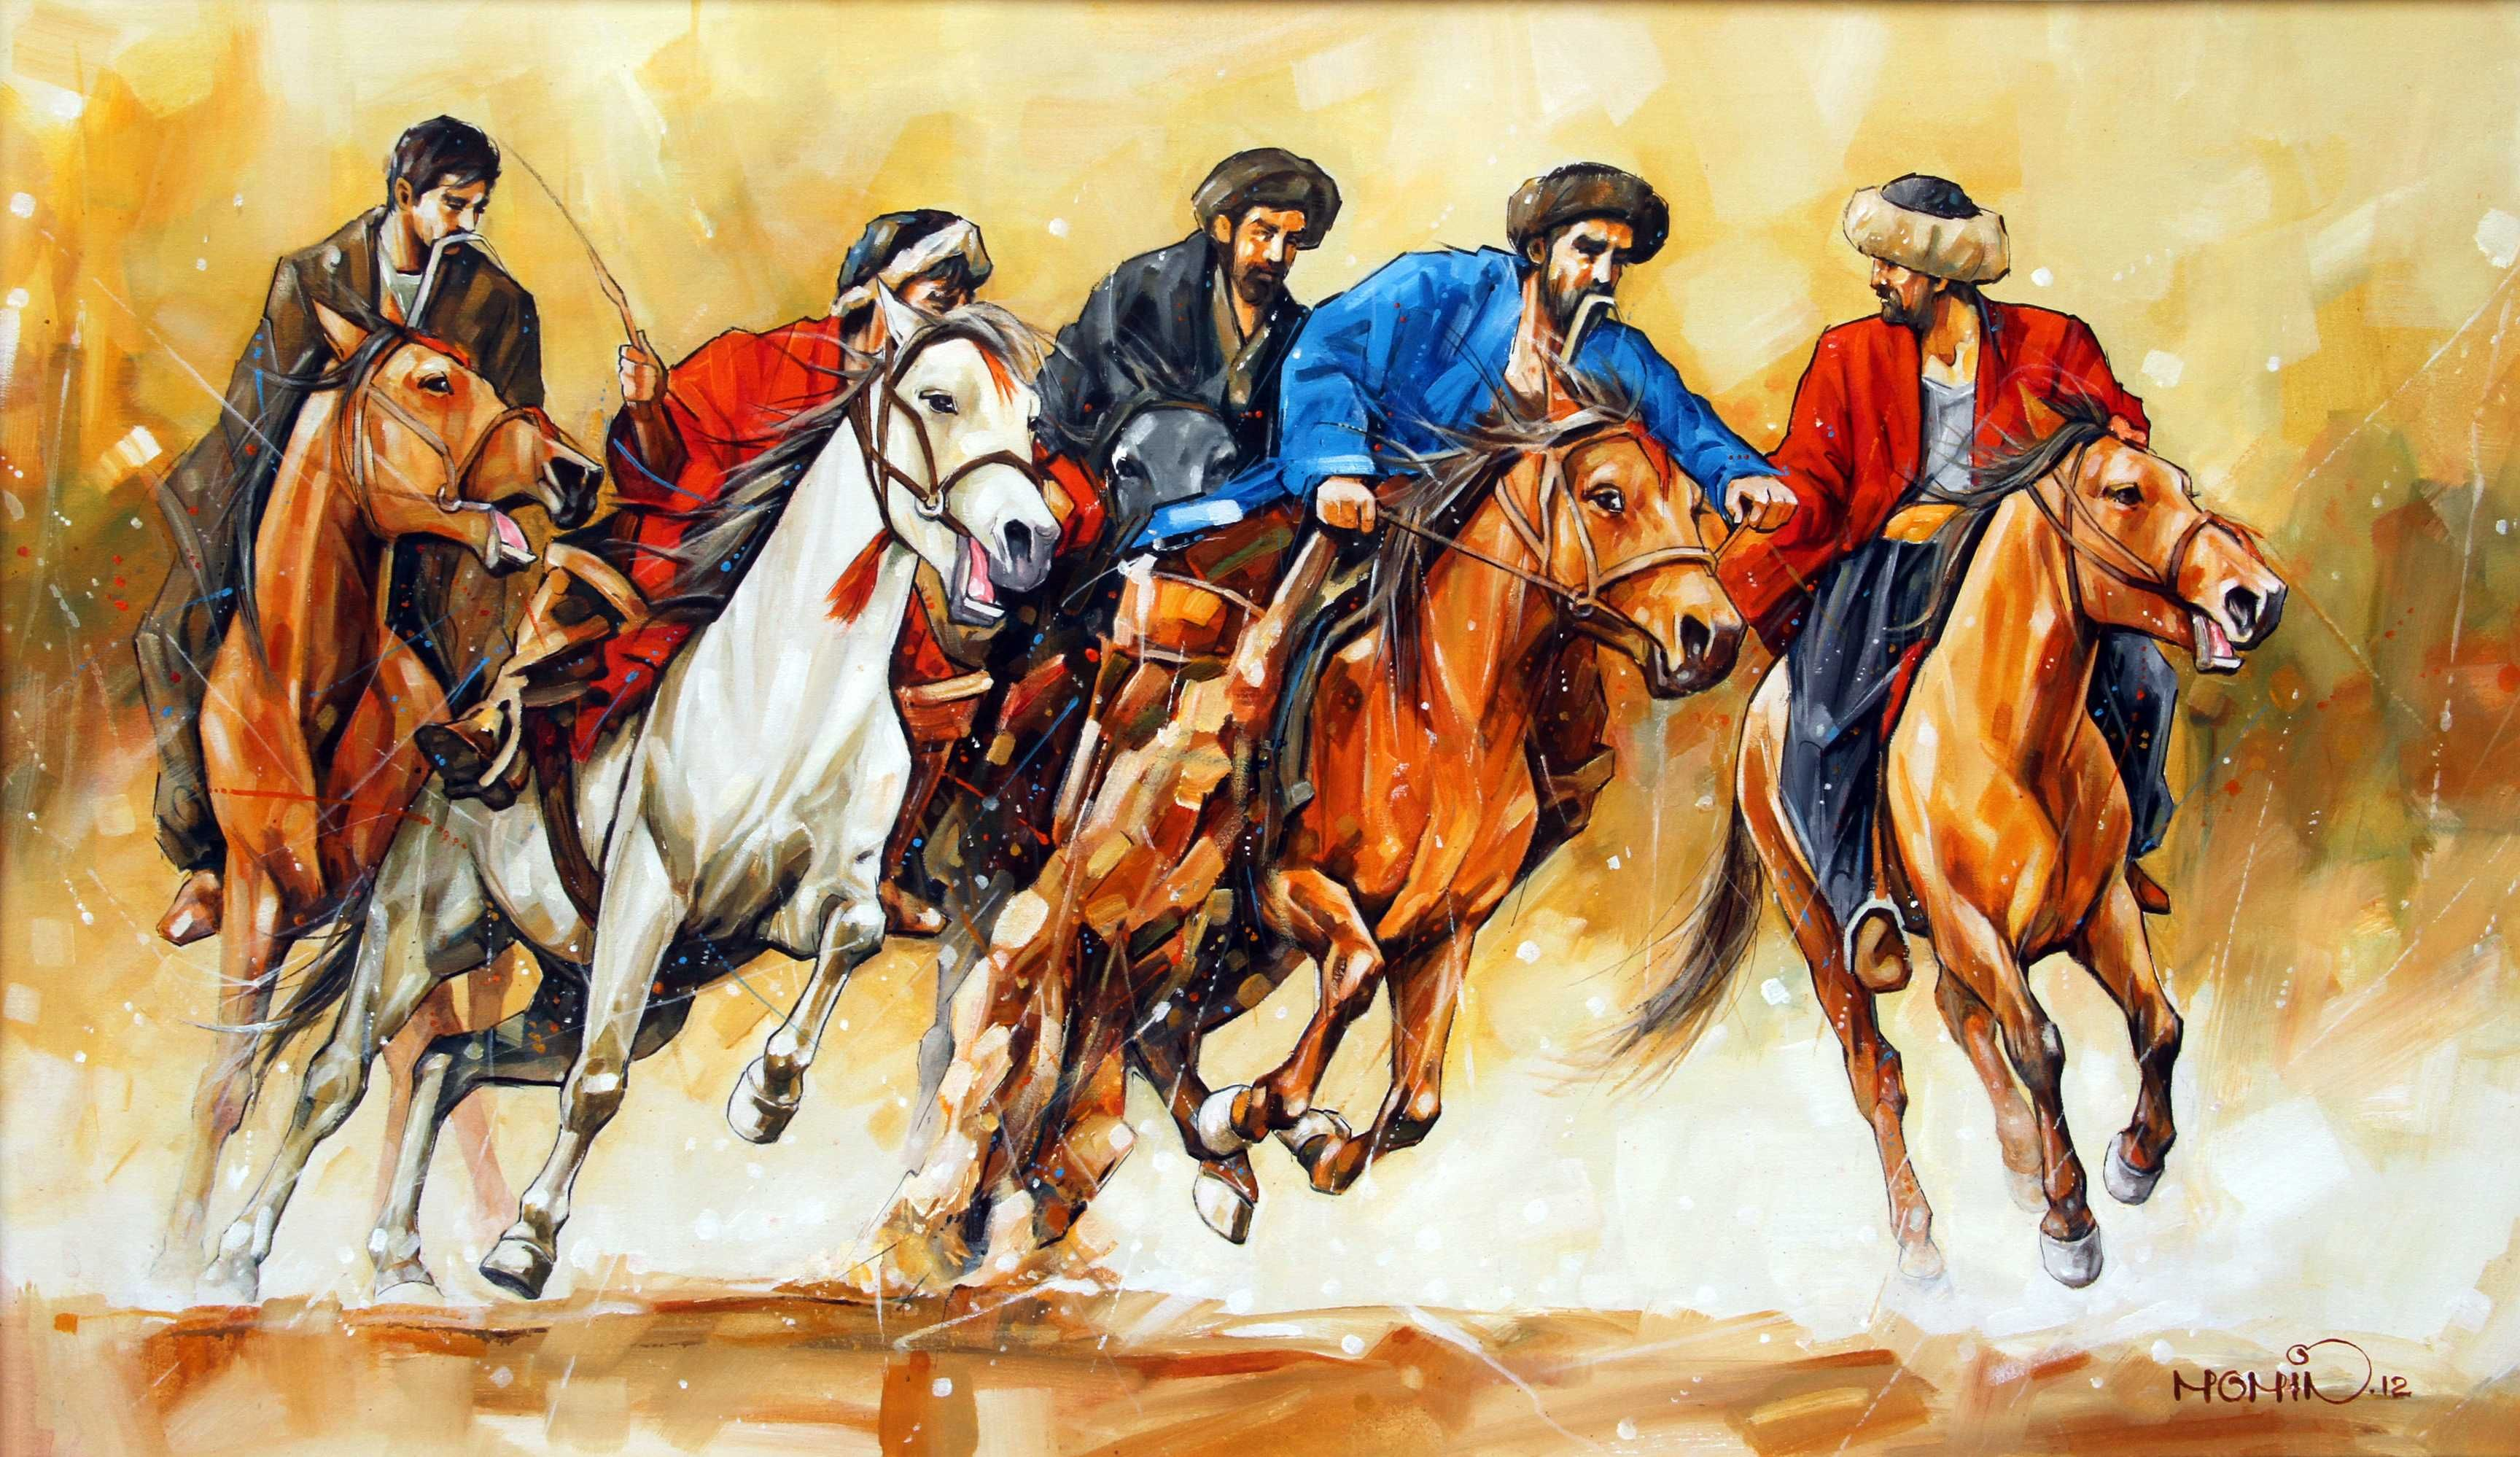 Pakistan Art . Representations Painting Exhibition Fine 2